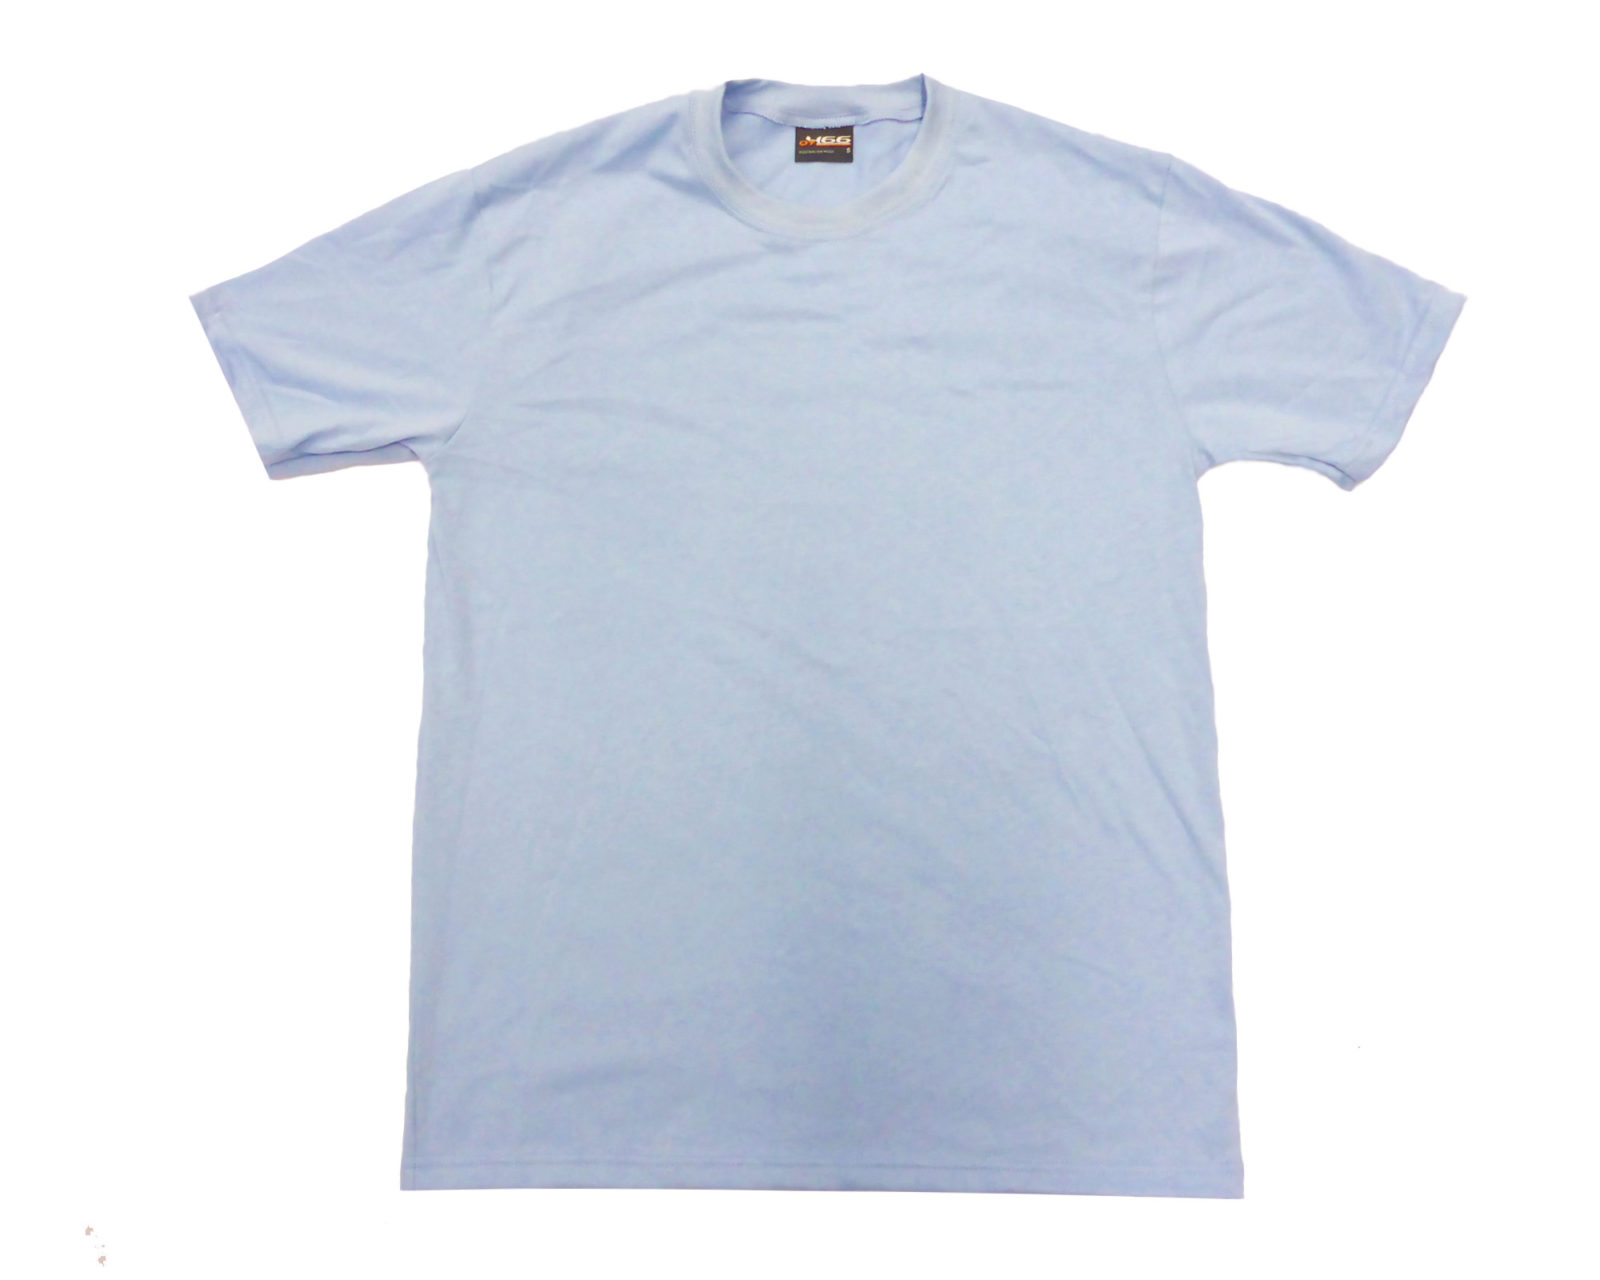 Qualitops Mens Short Sleeve Tee Cotton Australian made clothing